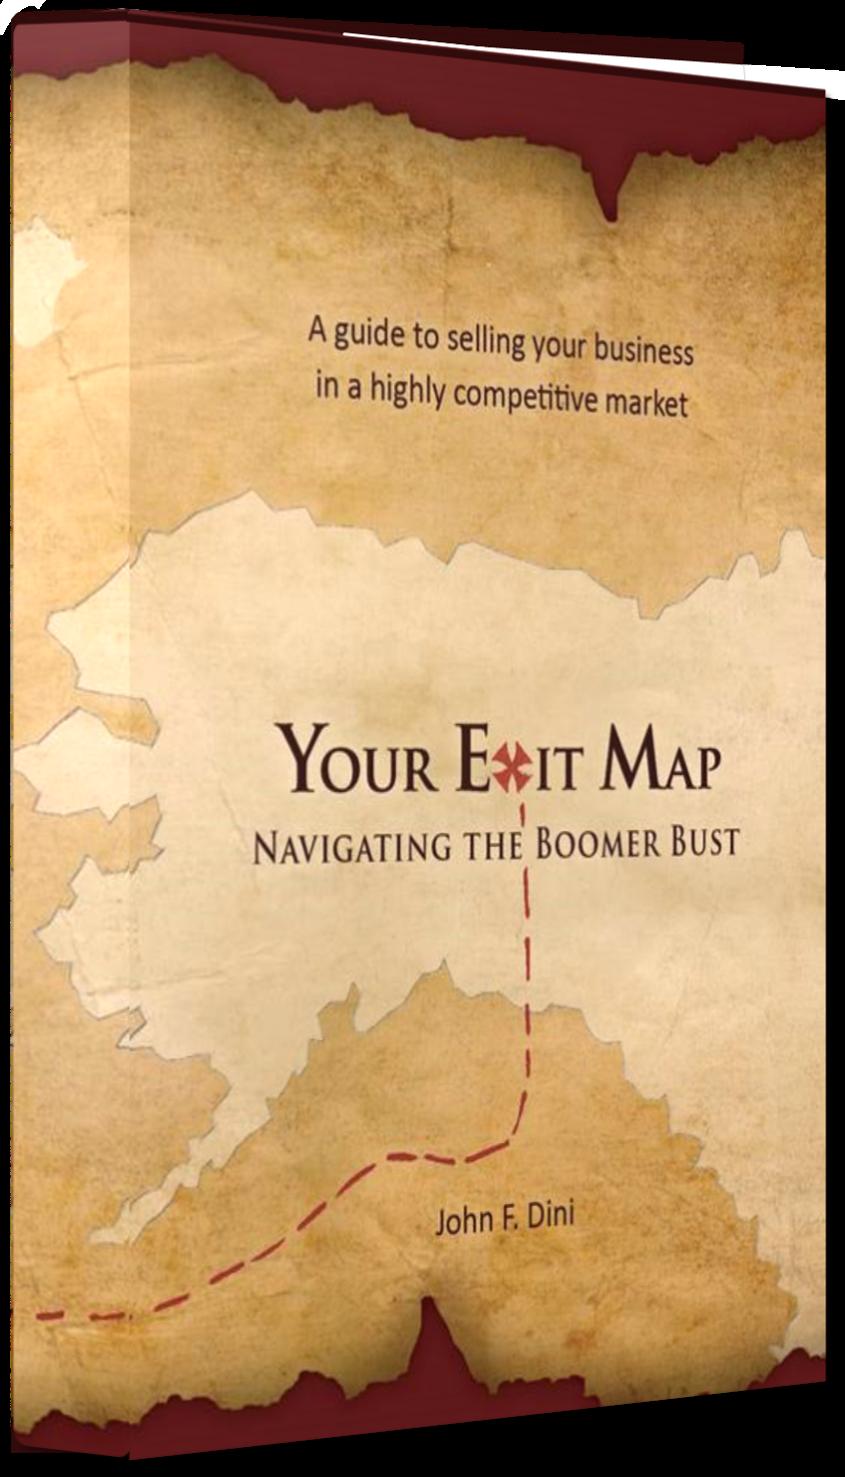 Books John F. Dini Your Exit Map